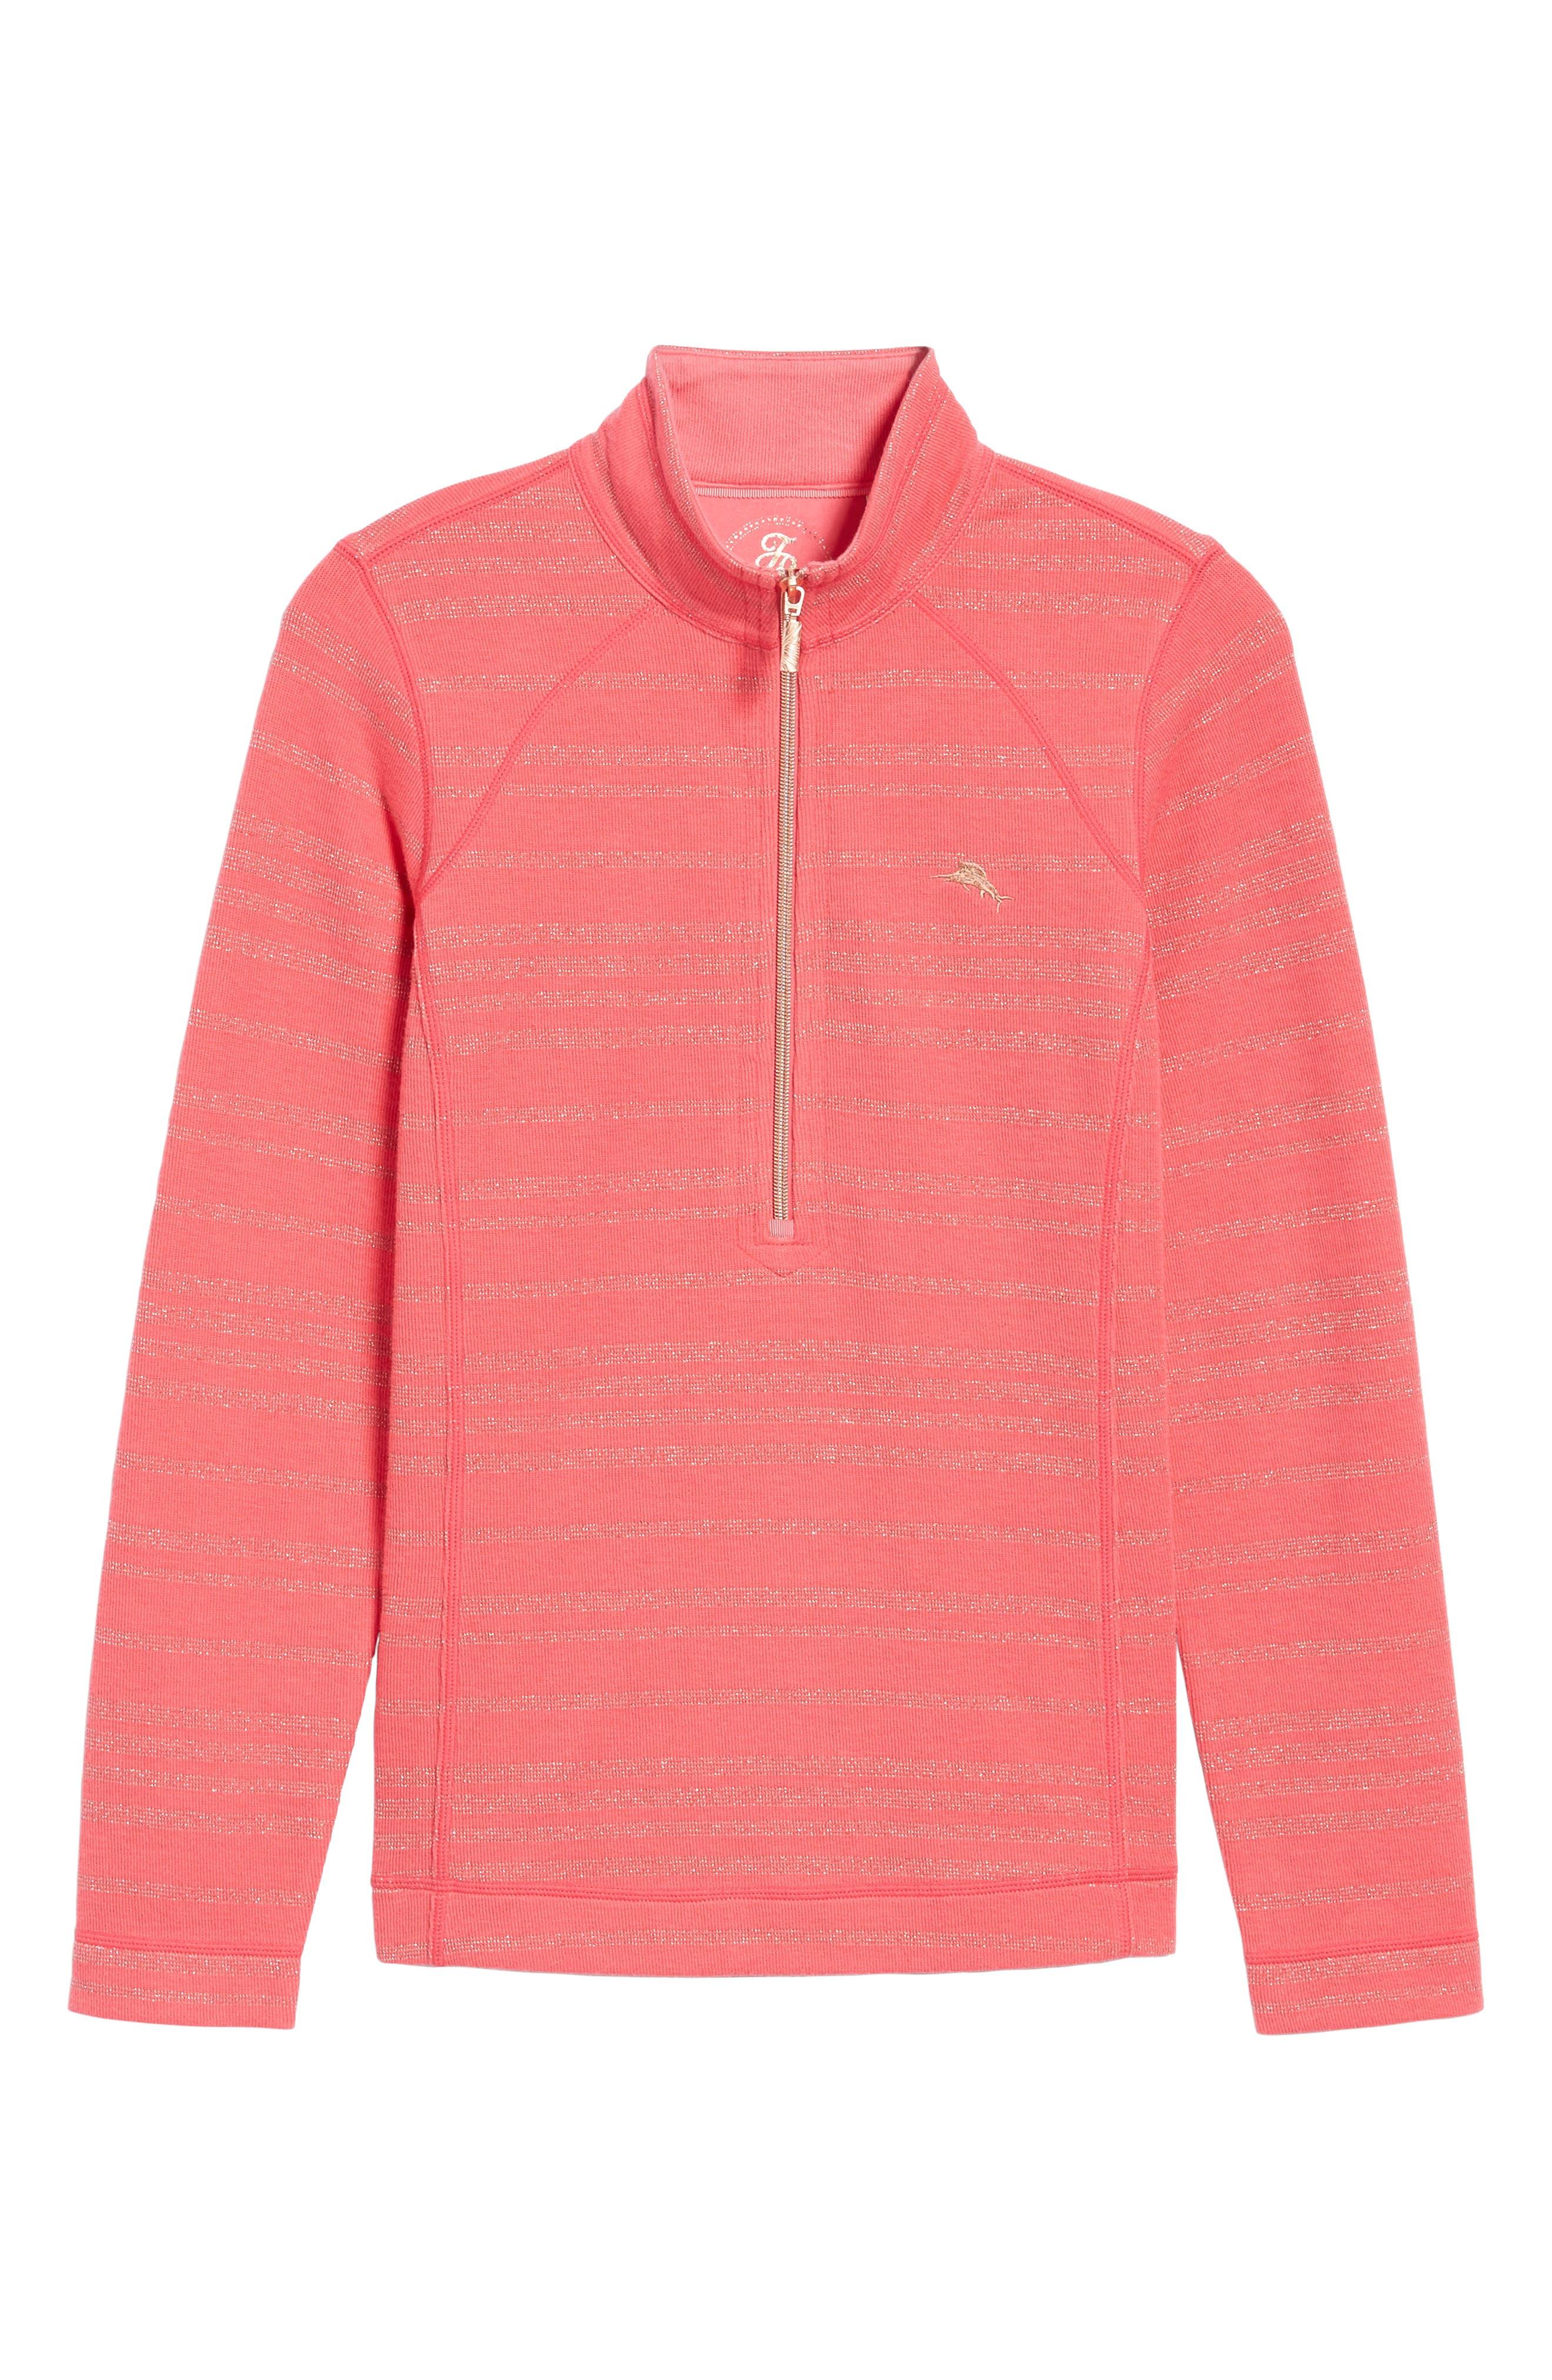 Aruba Shazam Stripe Half-Zip Pullover,                             Alternate thumbnail 6, color,                             Classic Pink